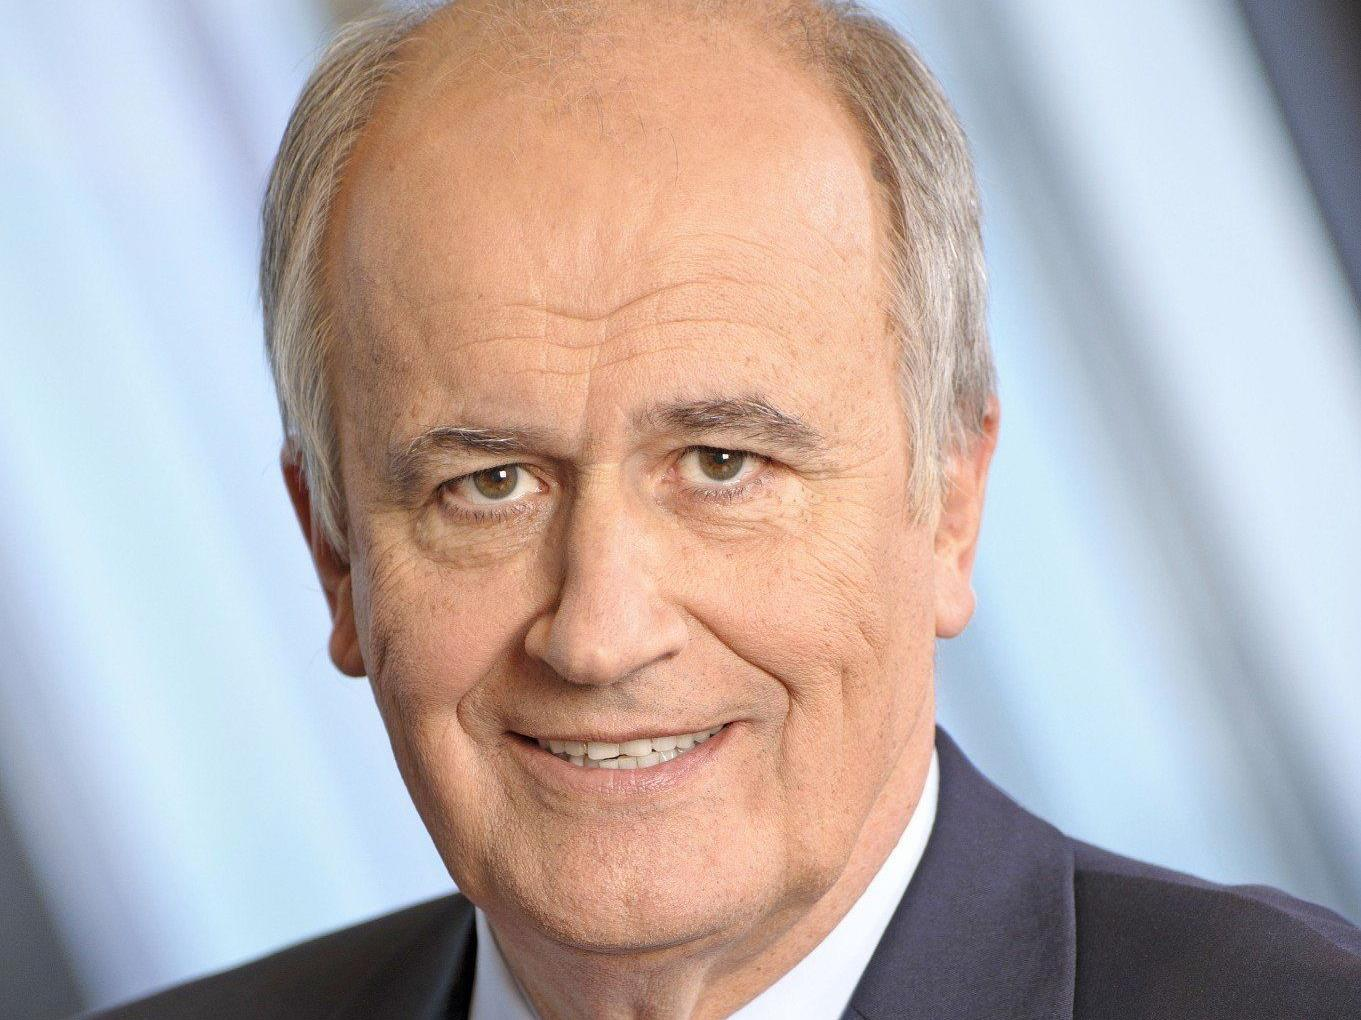 Vize-Vorstandsvorsitzender Karl Sevelda wird RBI-Chef